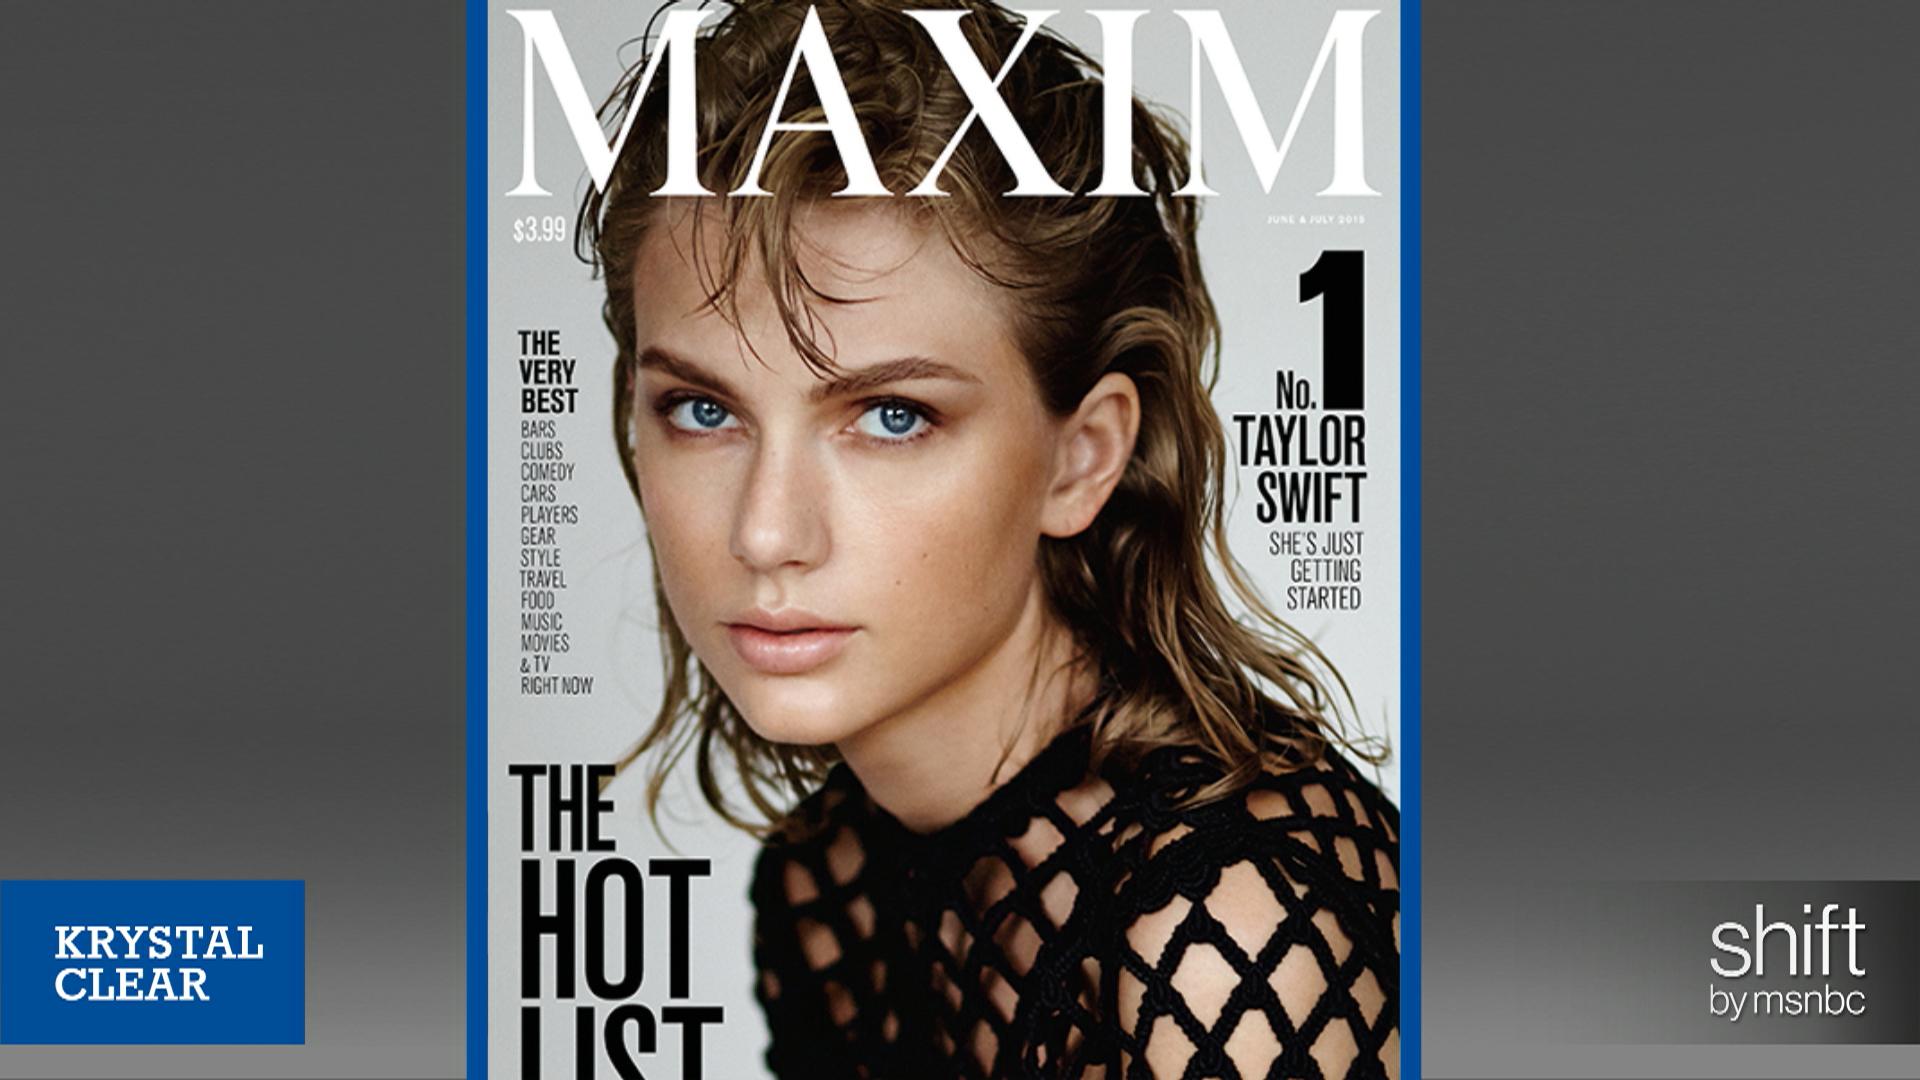 Taylor Swift explains feminism to Maxim